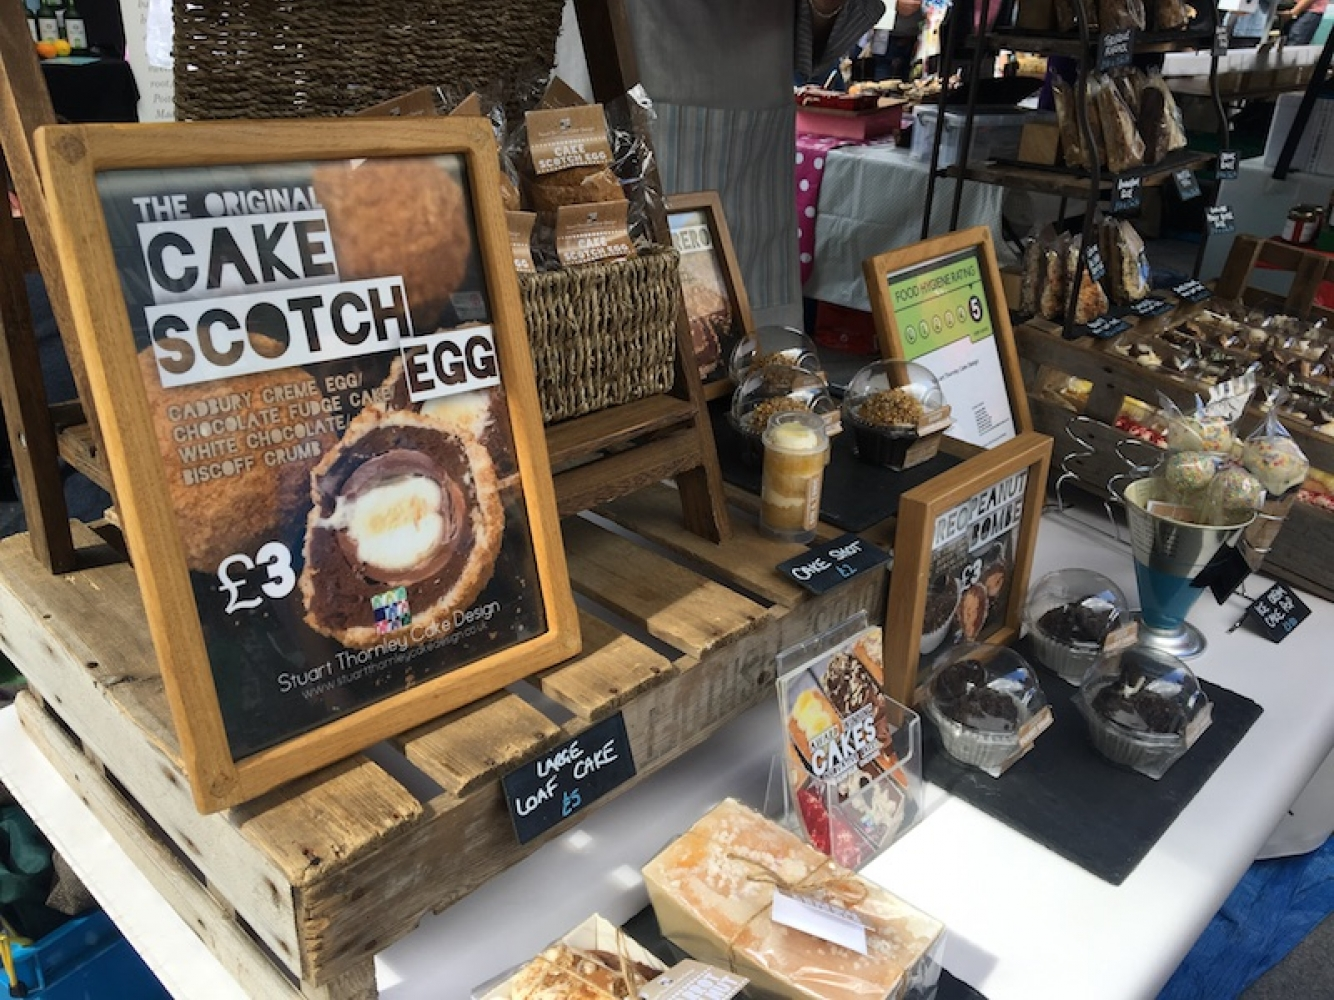 171012 Salford Food Drink Festival Photo 26 08 2017 13 56 07